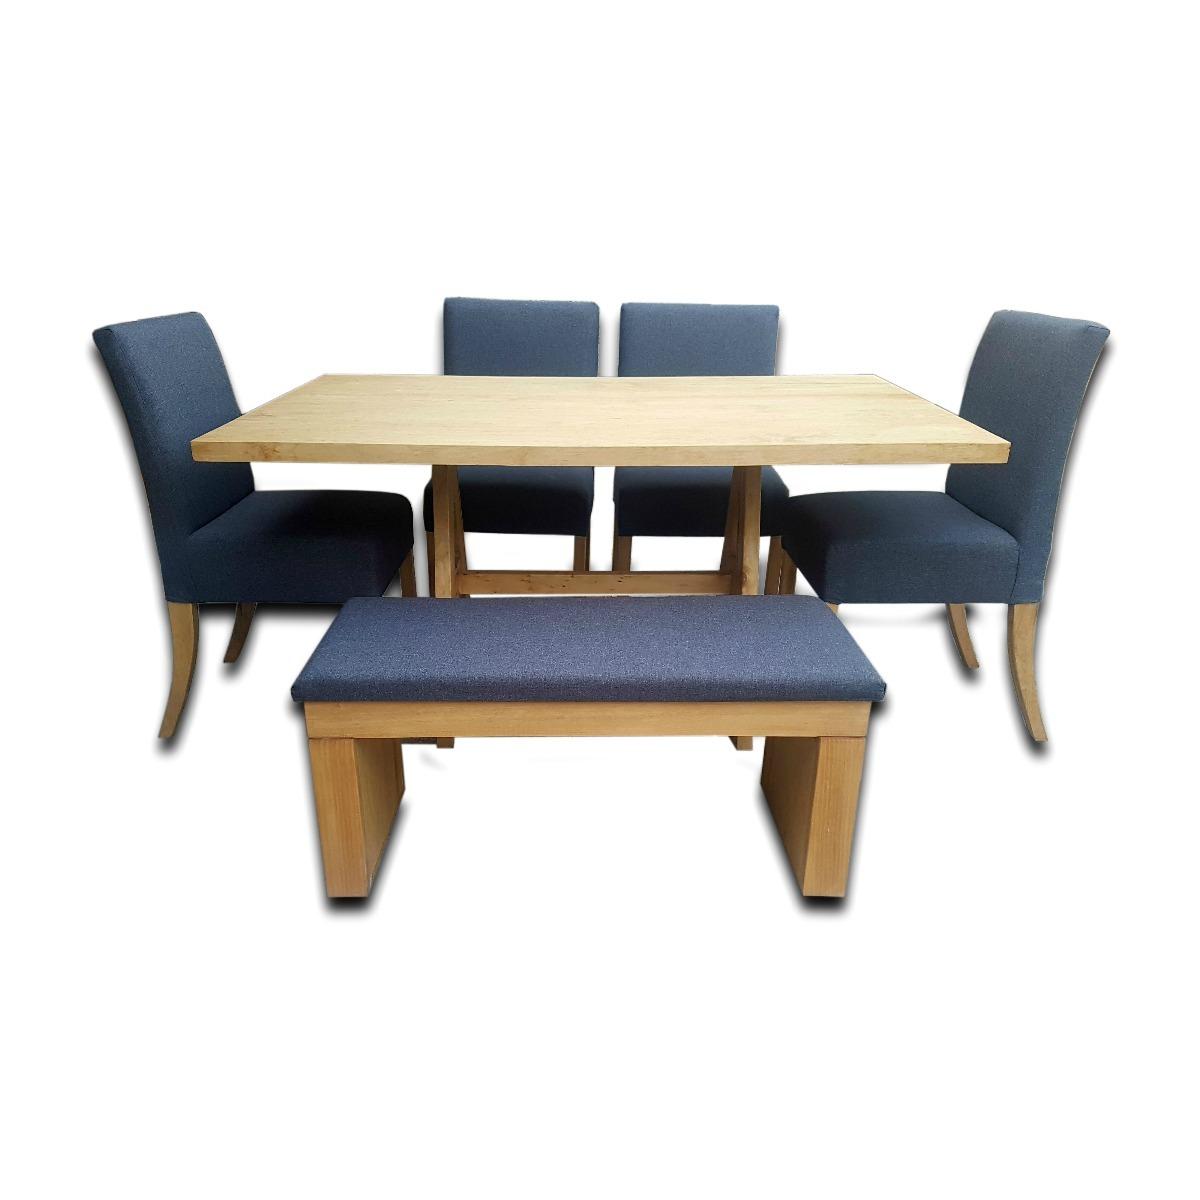 Comedor moderno con banca para 6 personas de madera vr for Comedor moderno de madera